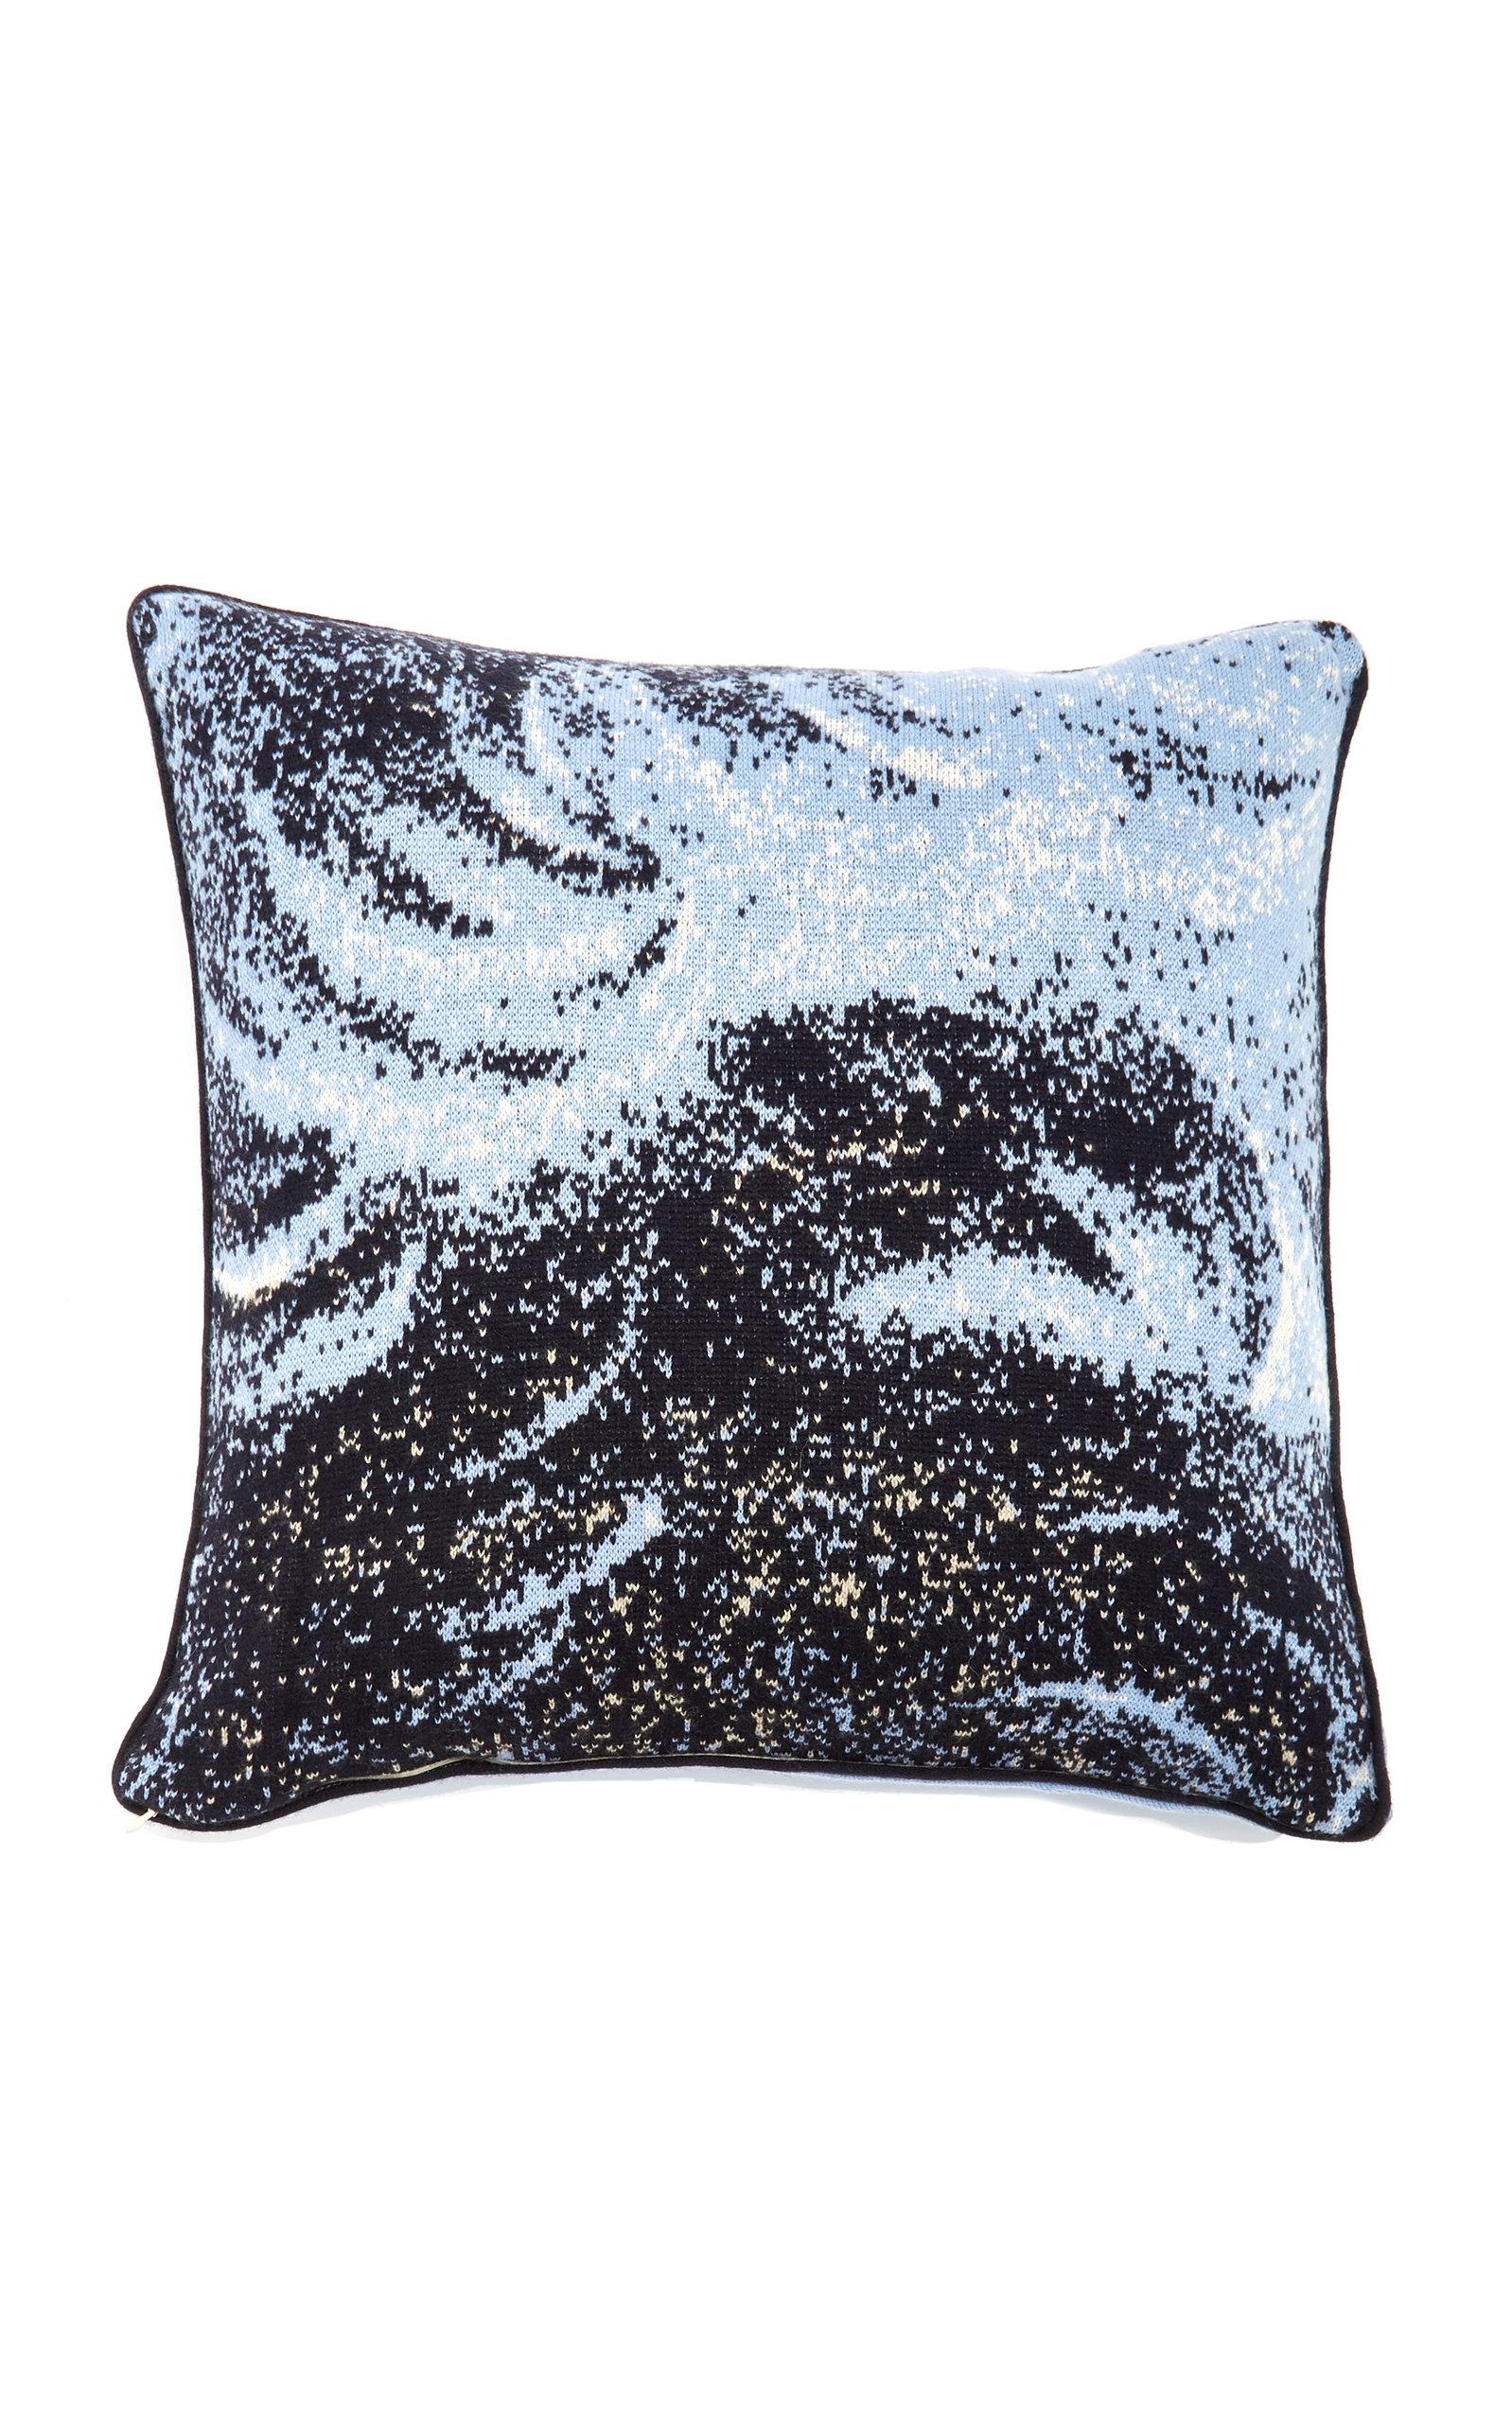 Saved NY  – Roman Bear Cashmere Throw Pillow – Color: Grey/red – Material: 100% cashmere – Moda Operandi